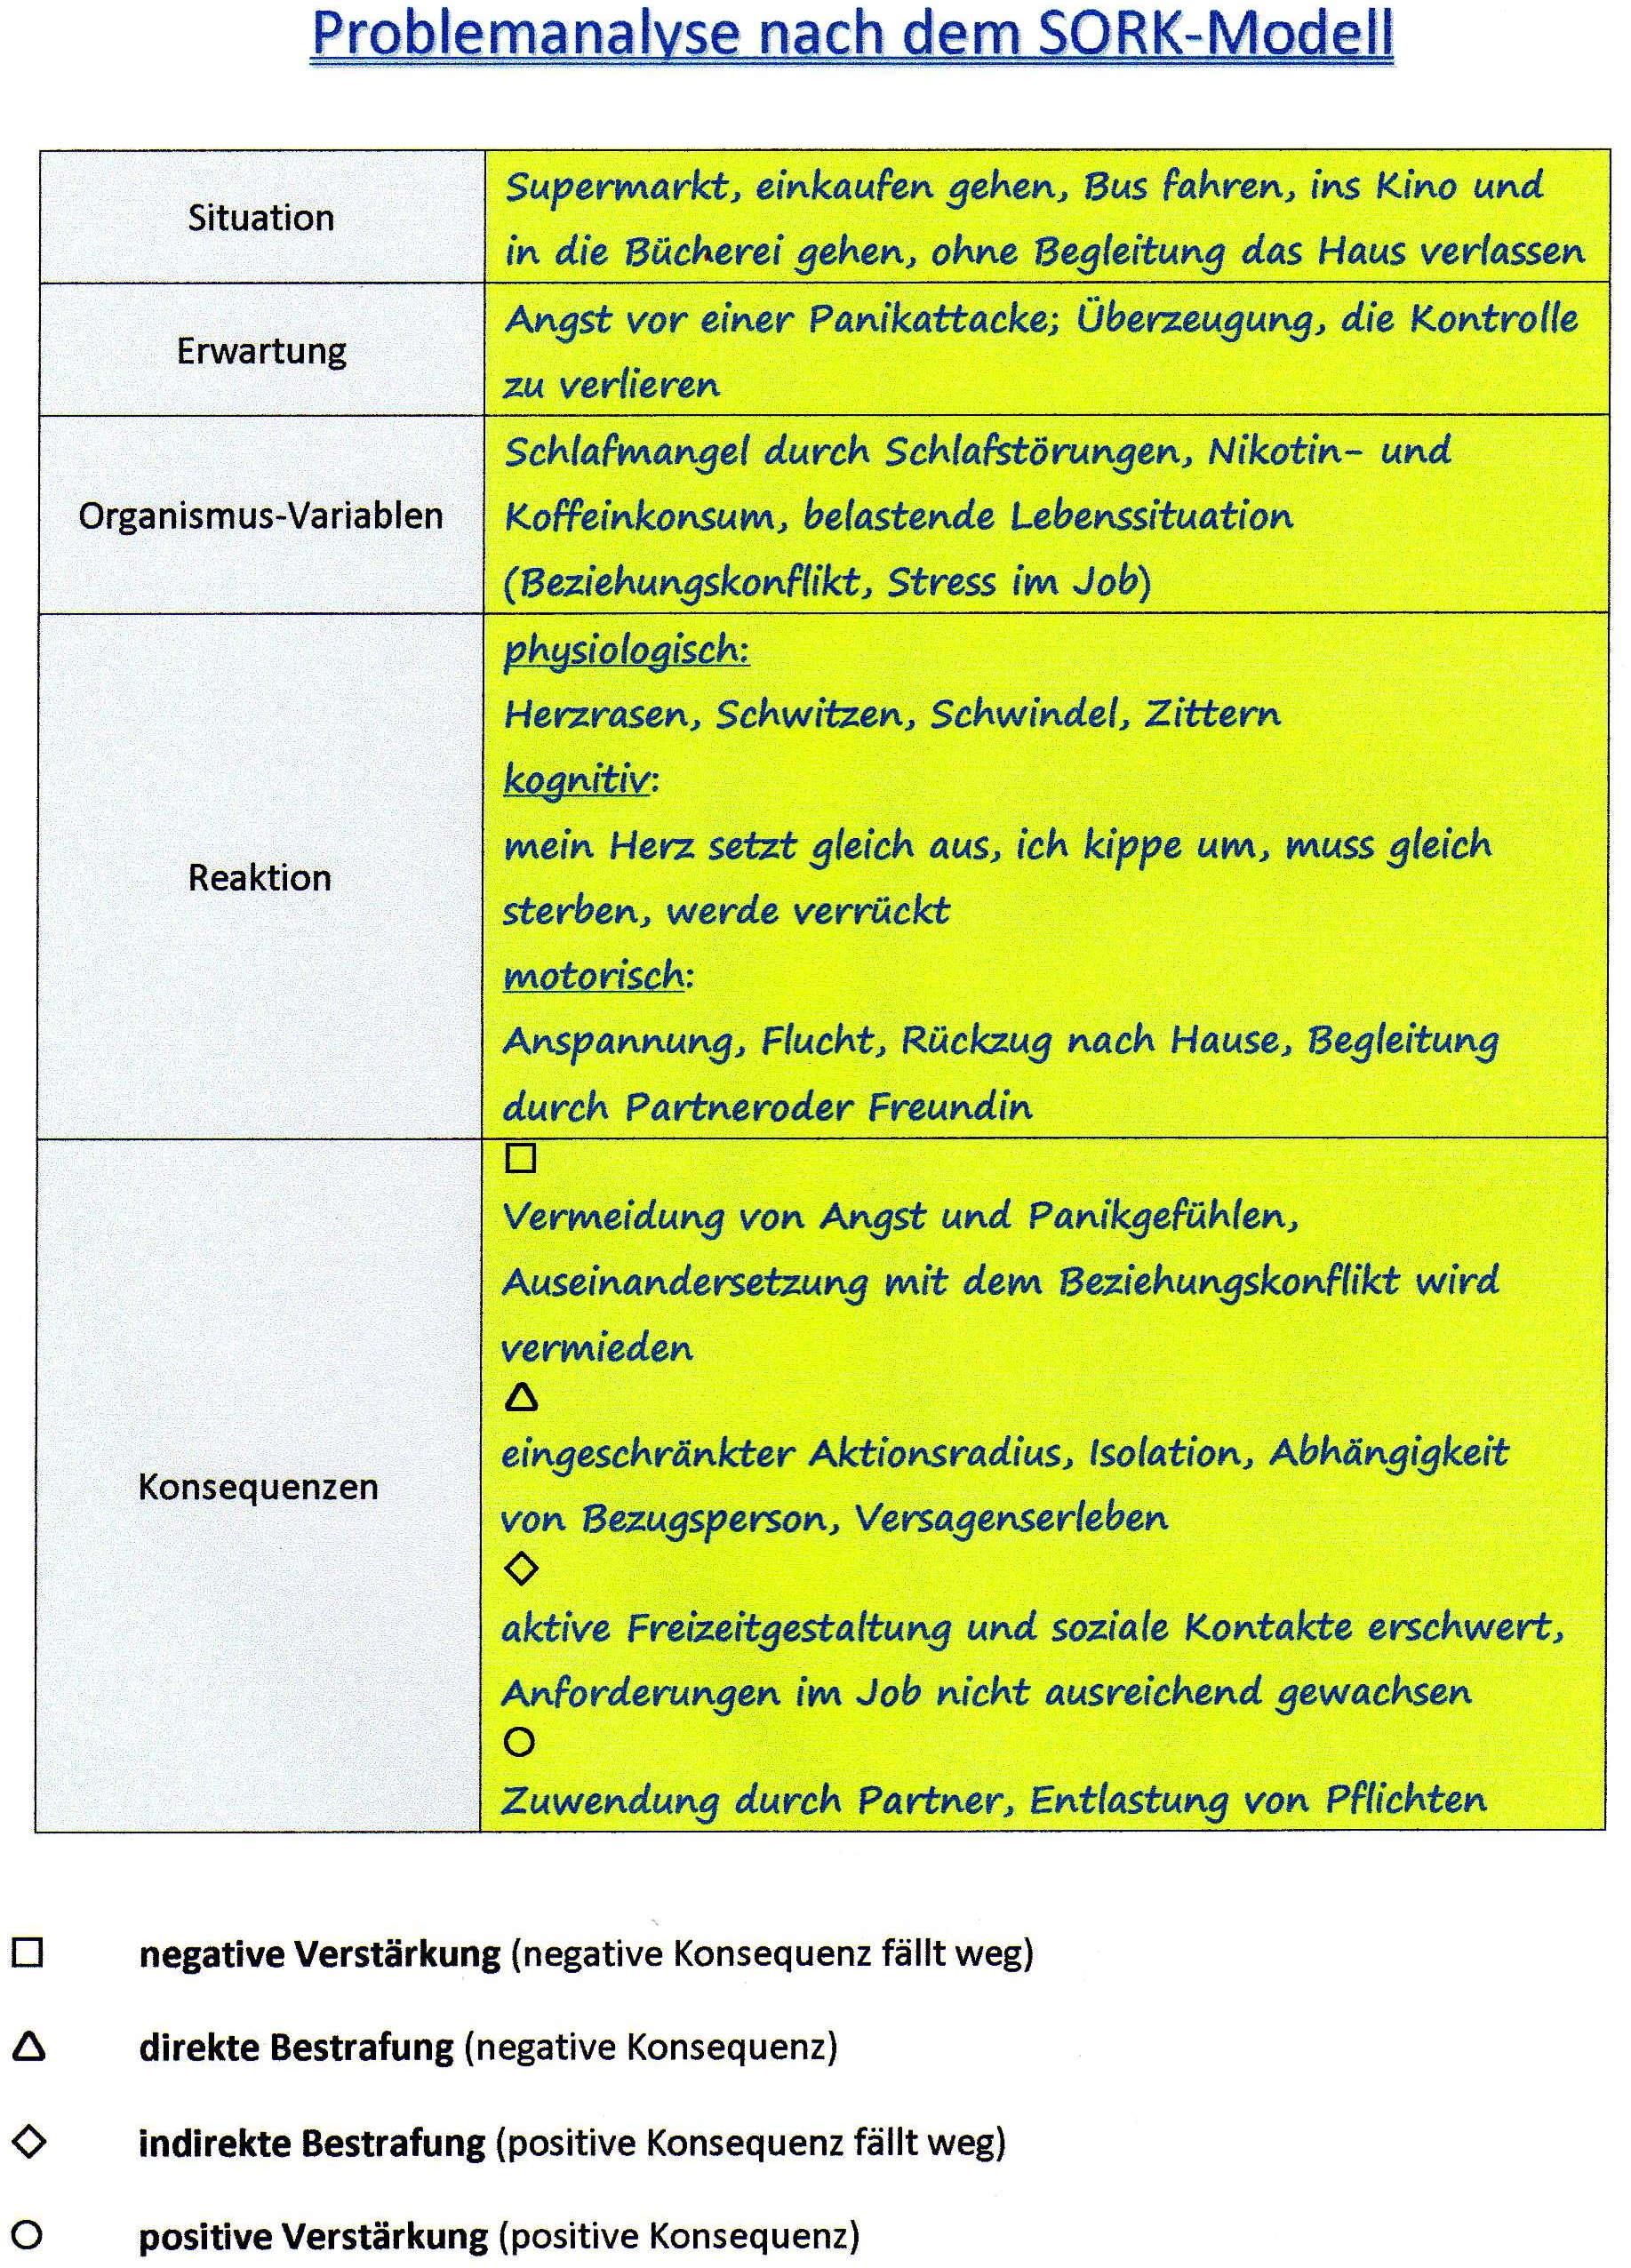 VT - Problemanalyse nach SORK-Modell